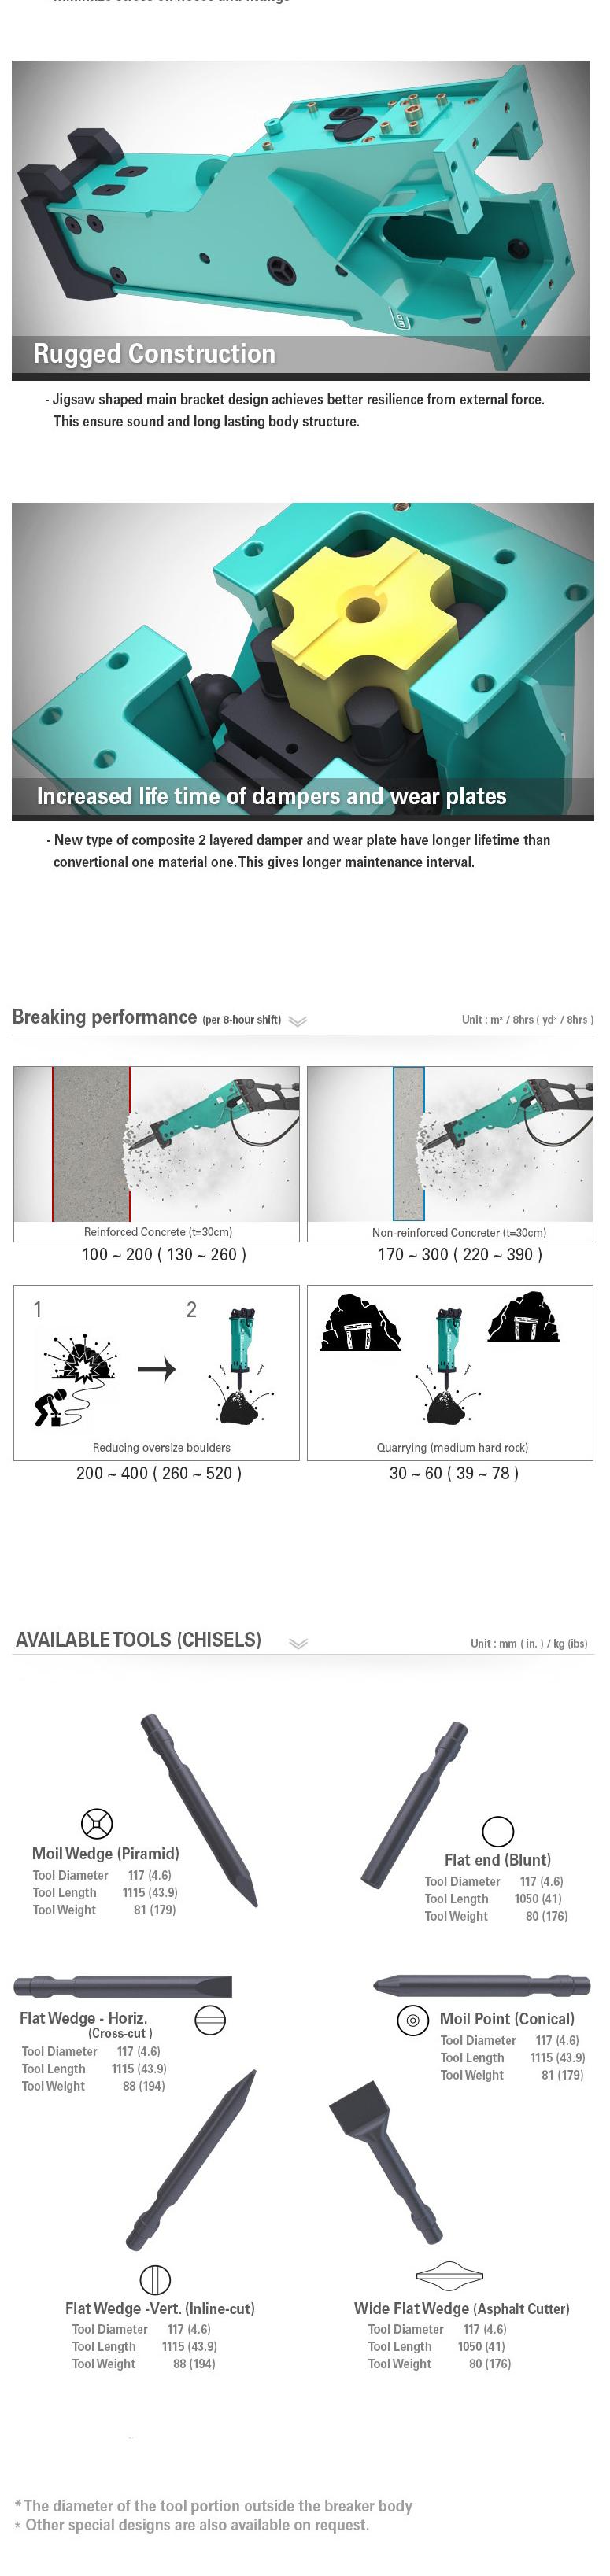 EVERDIGM Hydraulic Breaker (Box Housing) EHB17 2